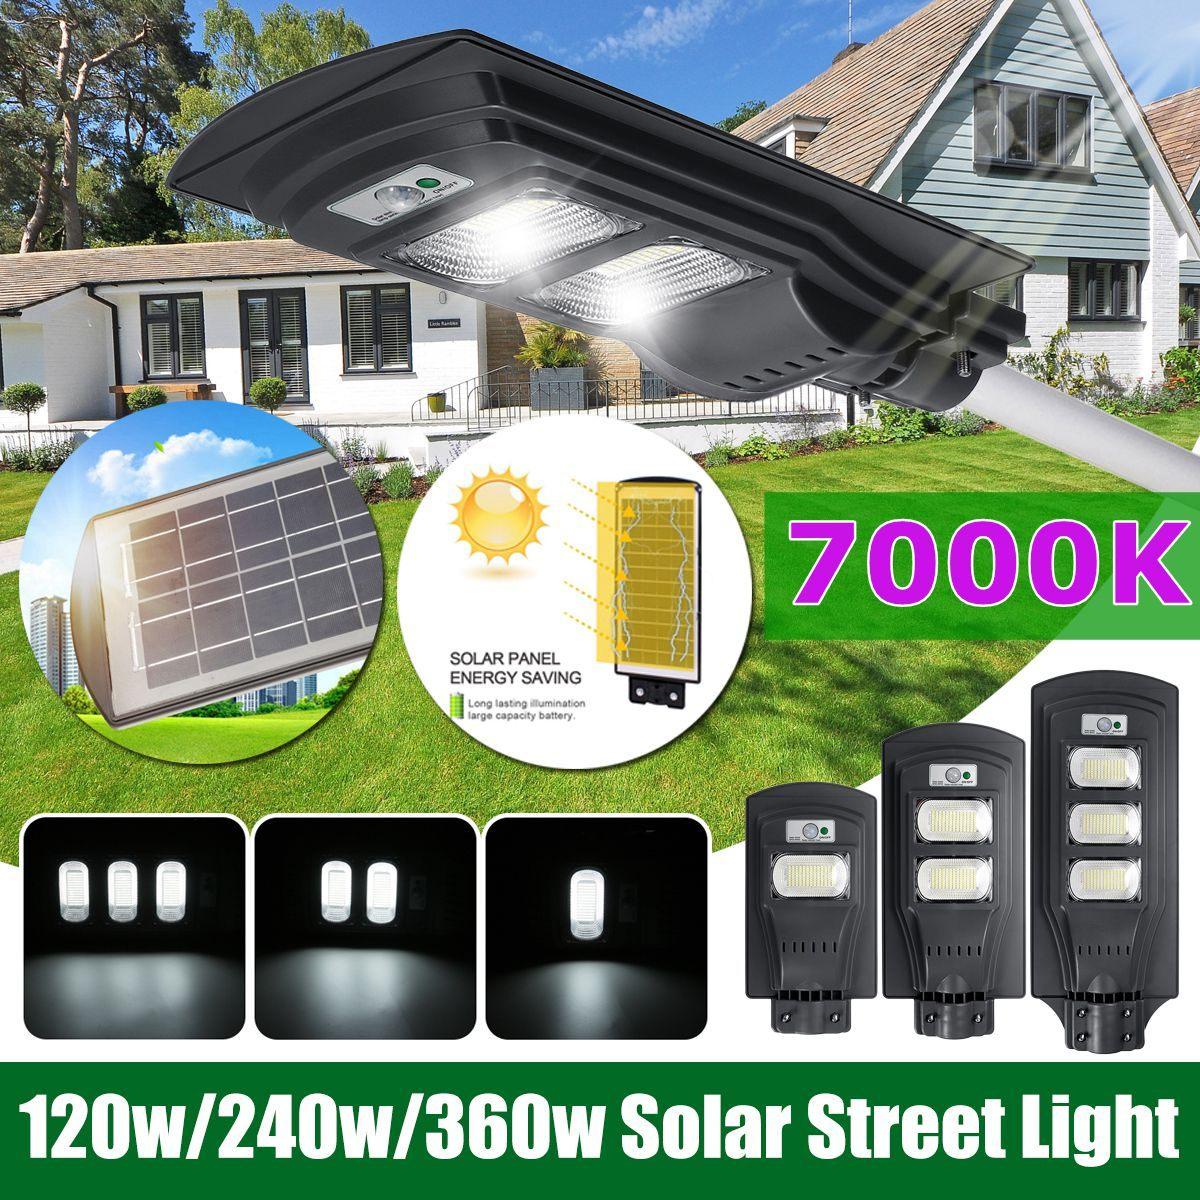 120W117LED/240W 234 LED/360W 351LED Solar Street Light Dusk to Dawn Outdoor Security Light 7000K IP65 Waterproof